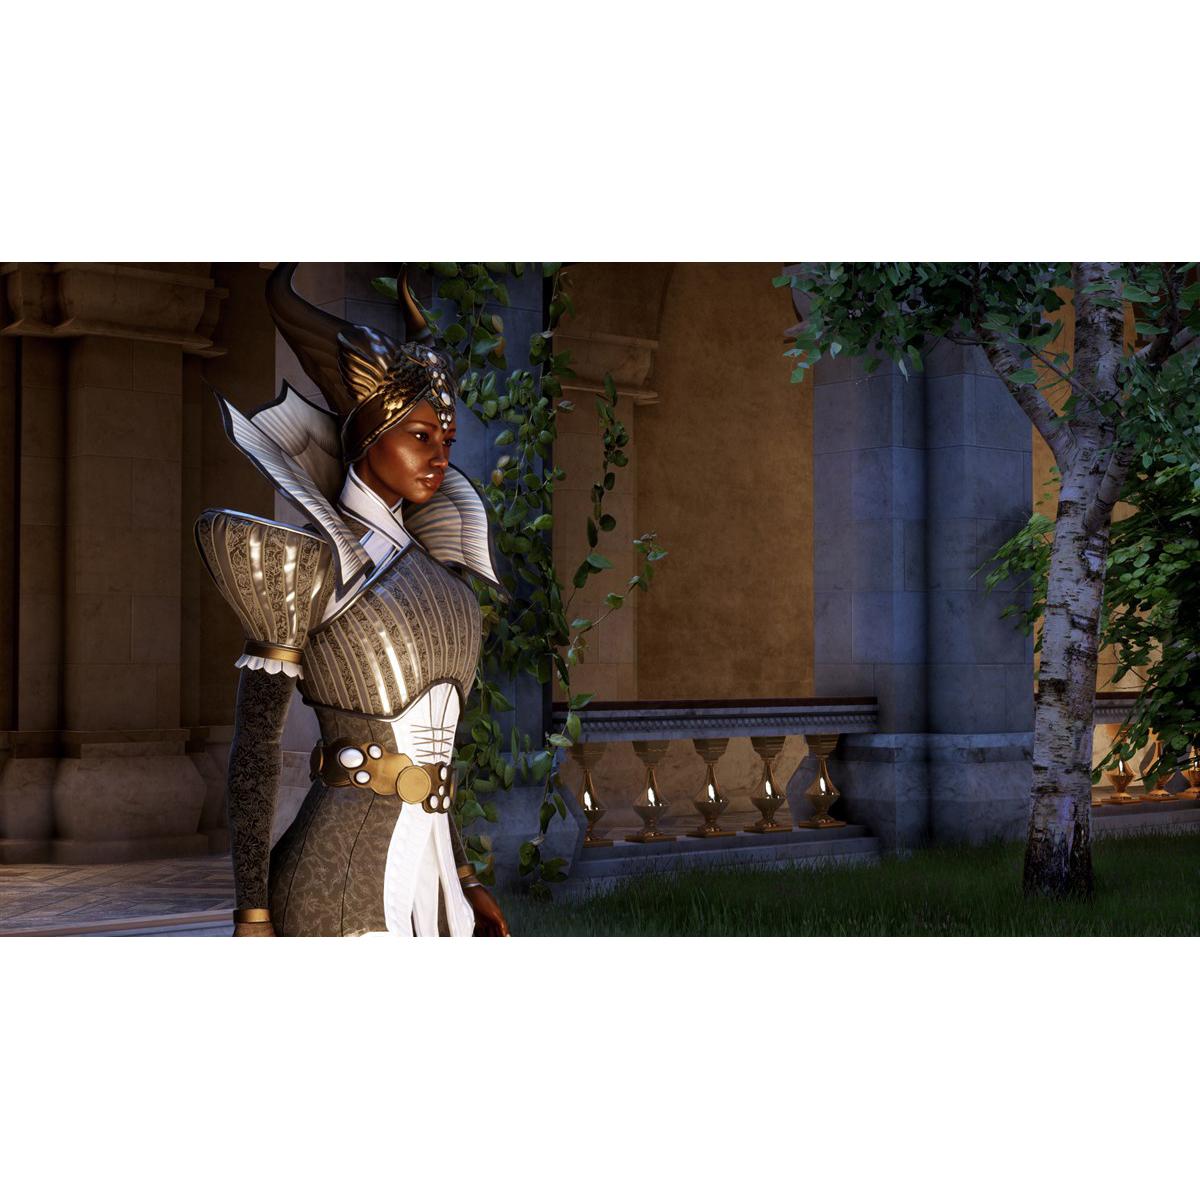 Joc Dragon Age: Inquisition pentru PlayStation 3 17